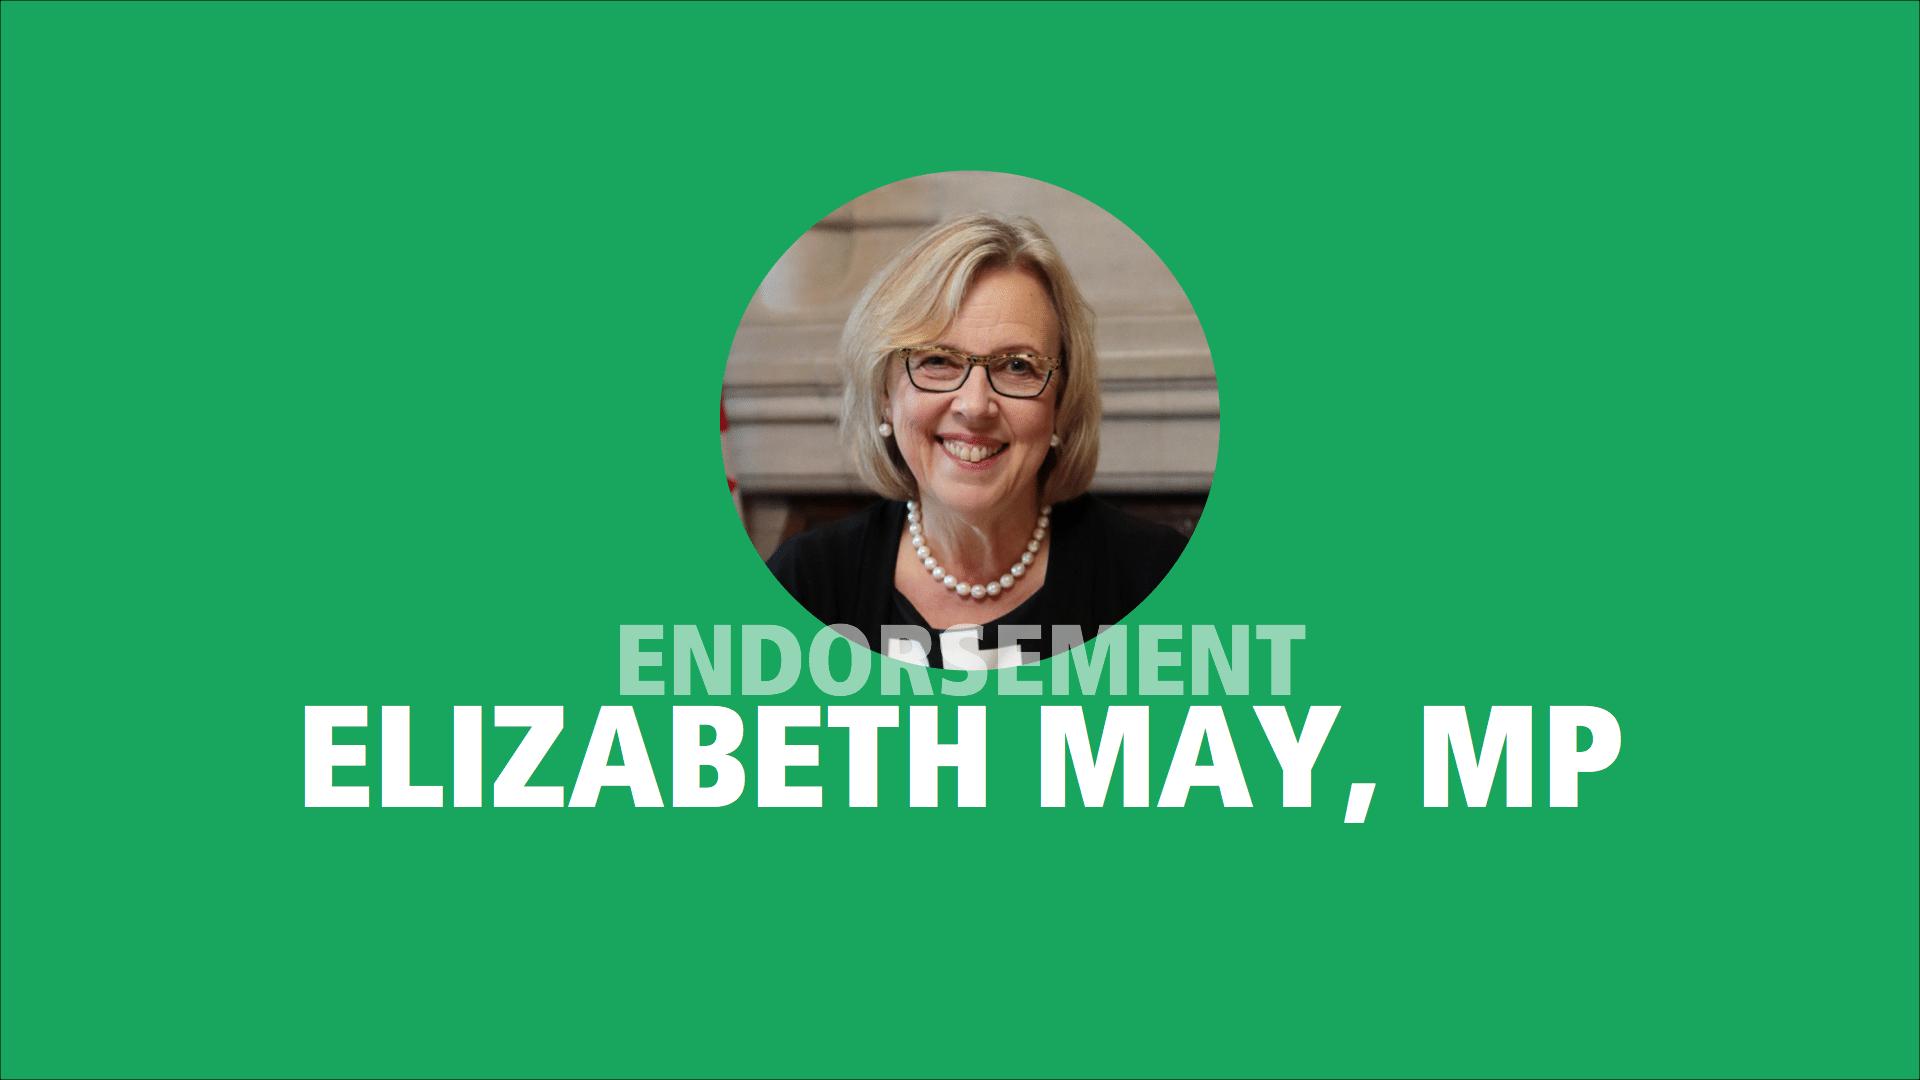 Elizabeth May, MP endorses Adam Olsen